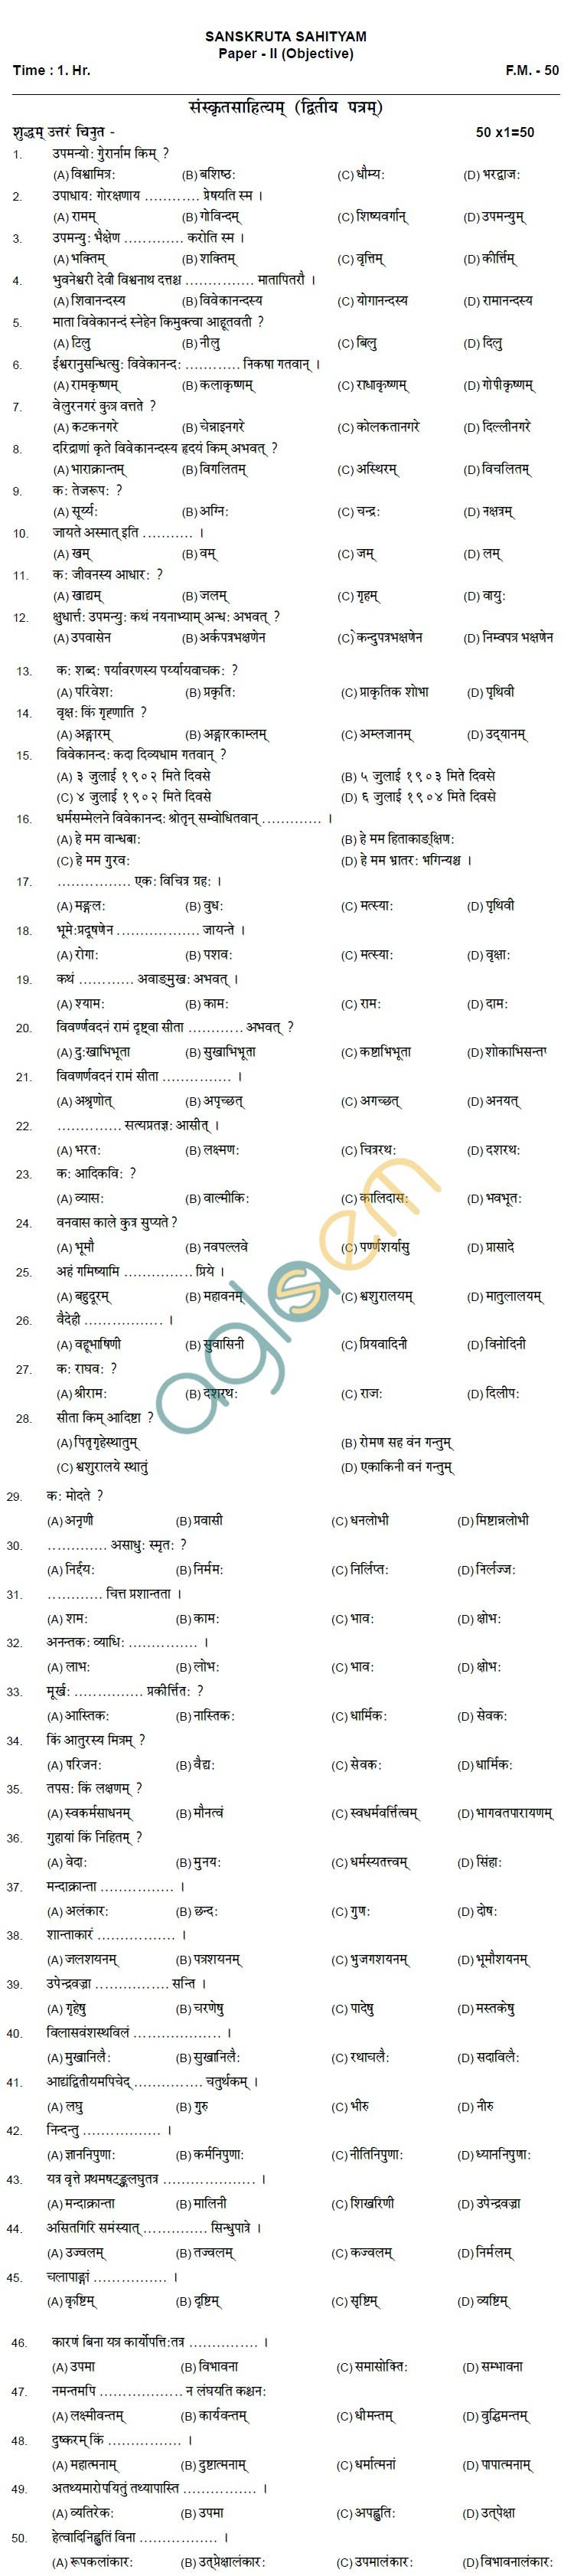 Odisha Board Sample Papers for Madhyama Sanskrit Exam 2014 - SHA